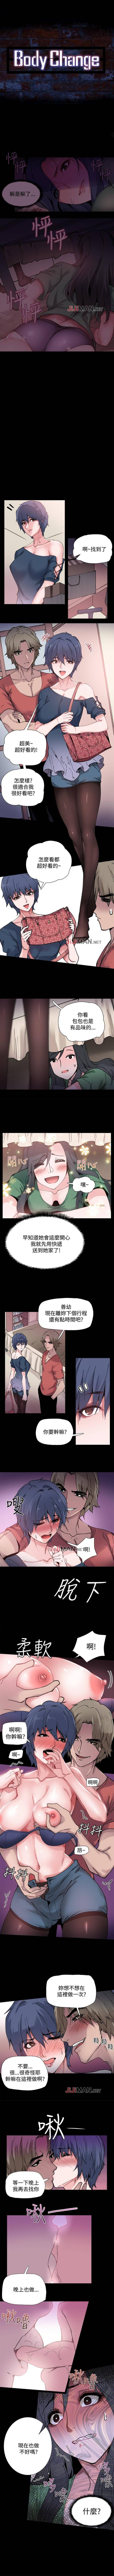 【已完结】Bodychange(作者:Seize & 死亡節奏) 第1~33话 7